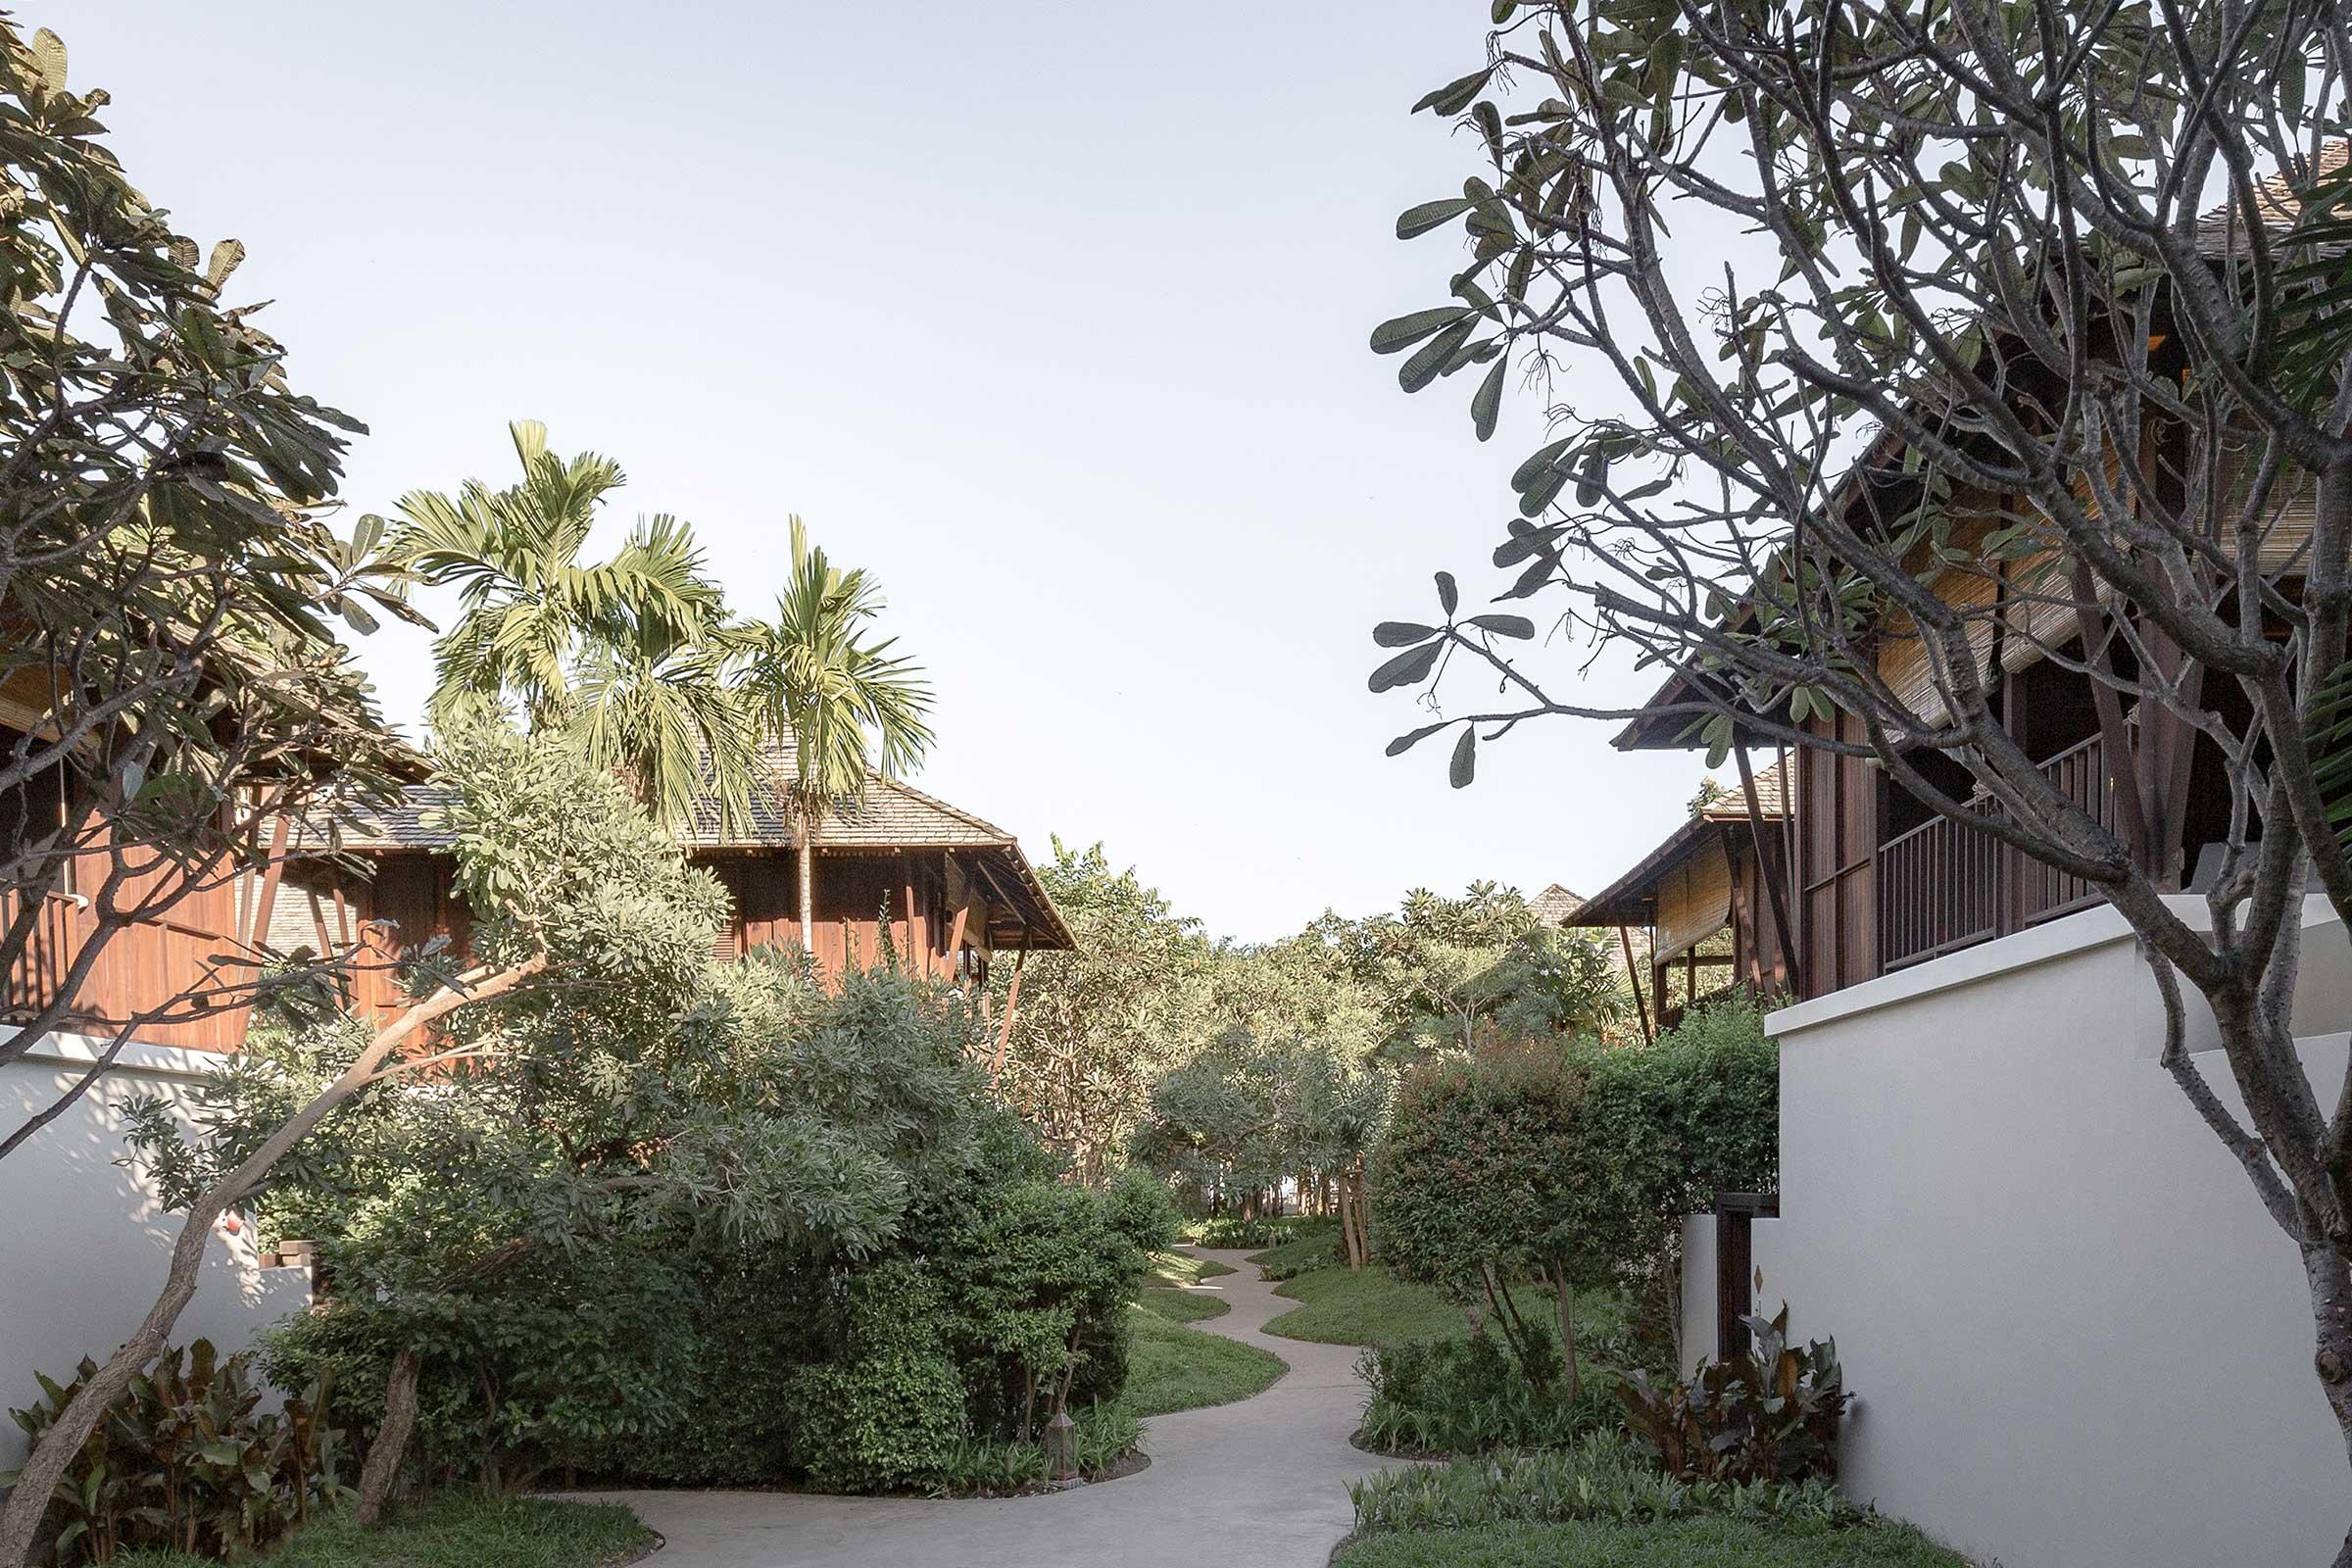 5-Palayana-Hotel-Resort-Architectkidd.jpg